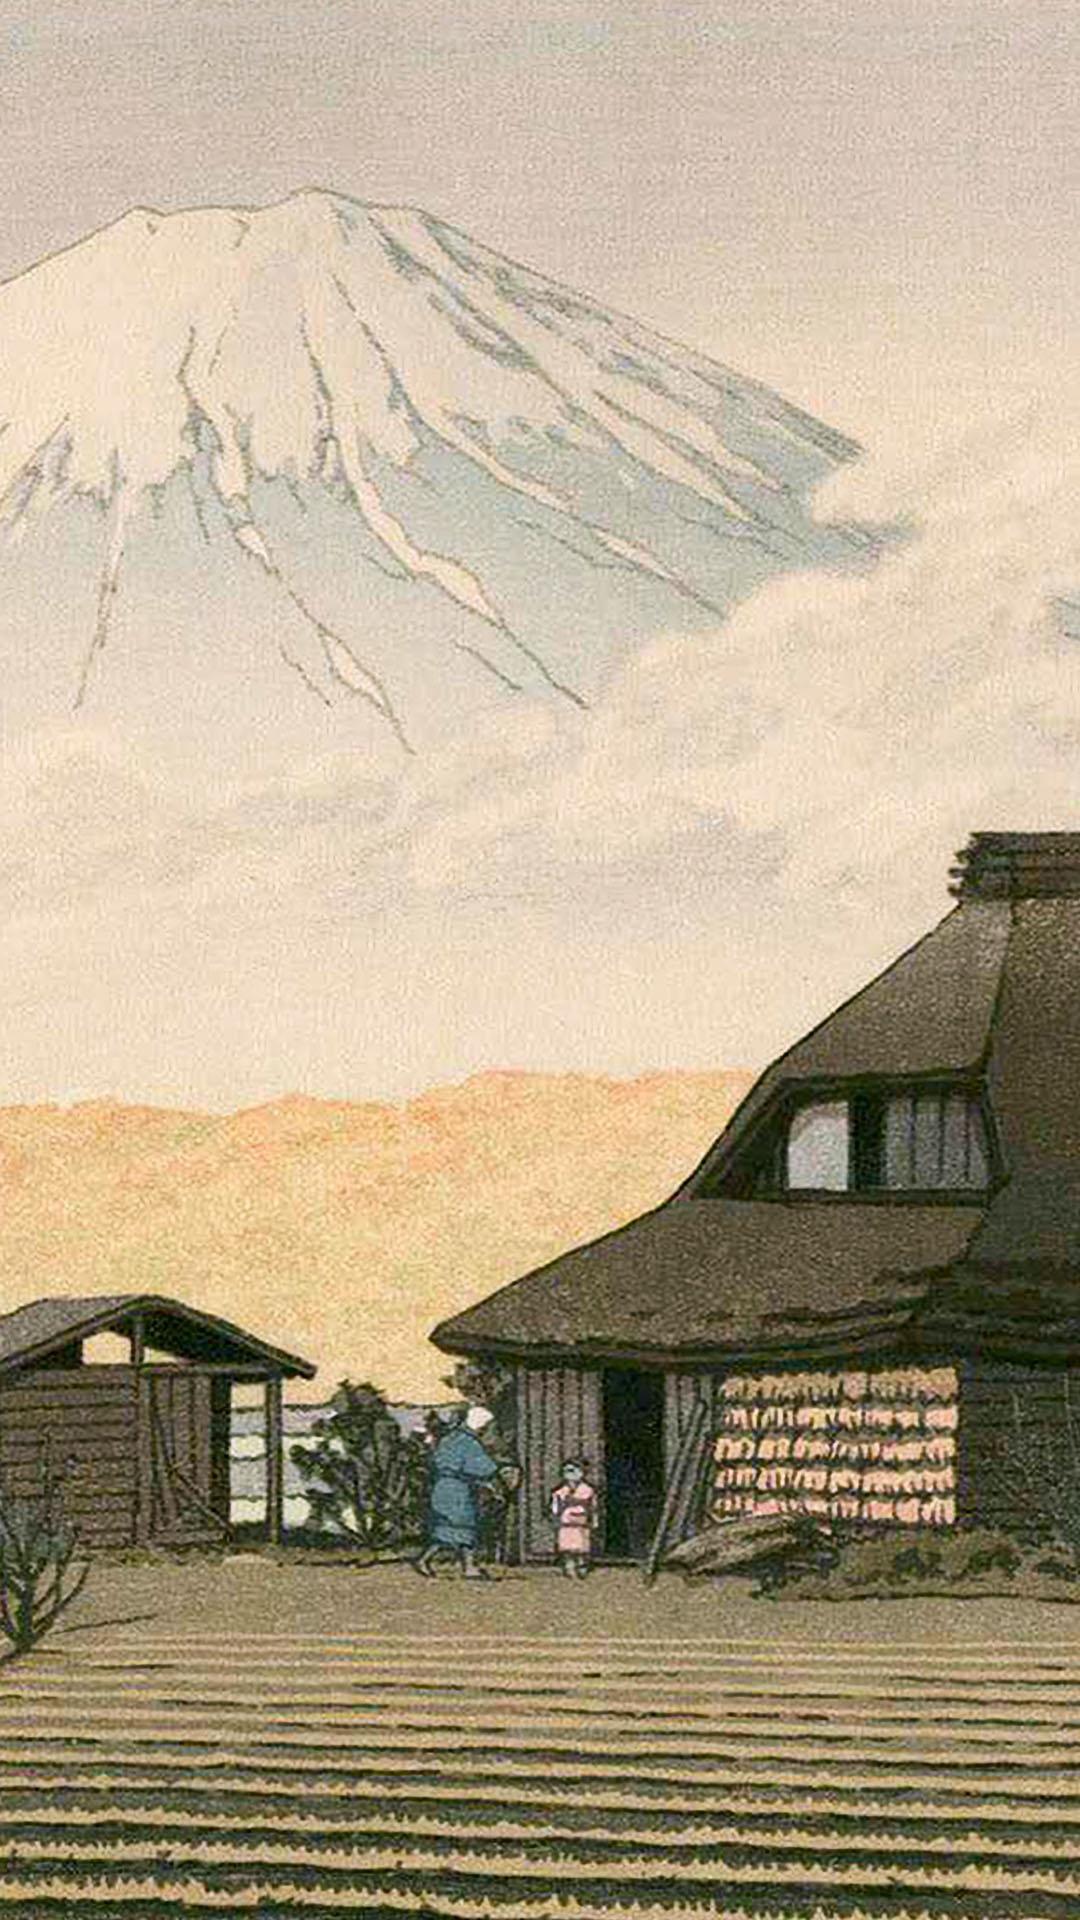 Kawase Hasui - Narusawa no fuji 1080x1920